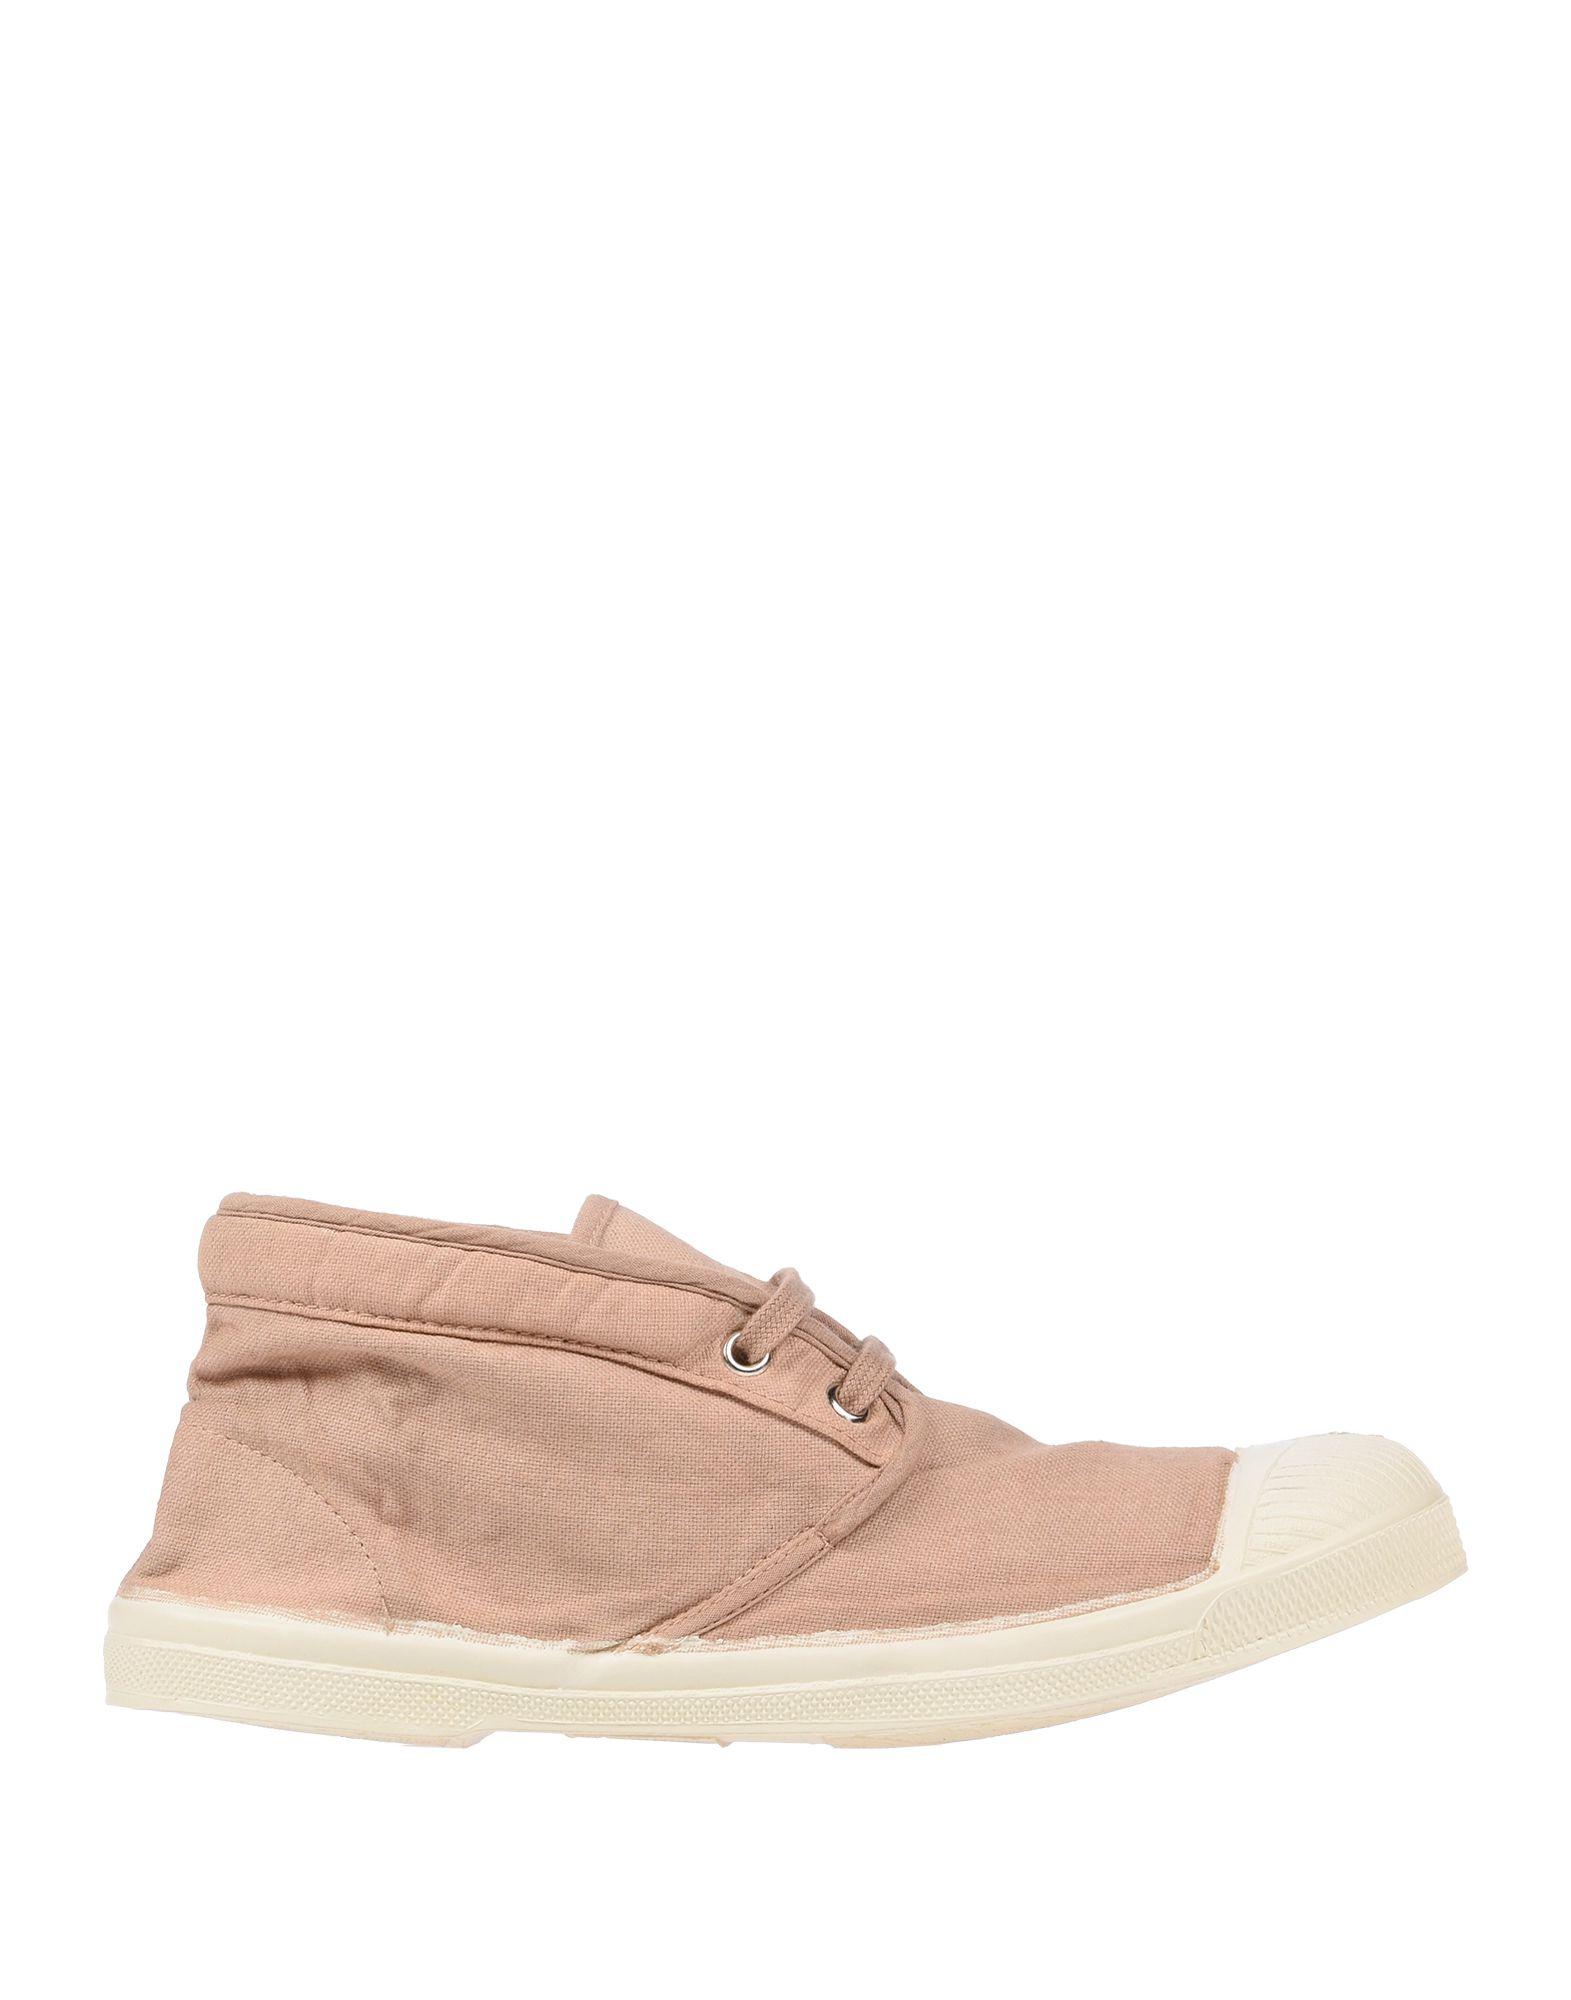 Bensimon Sneakers In Sand